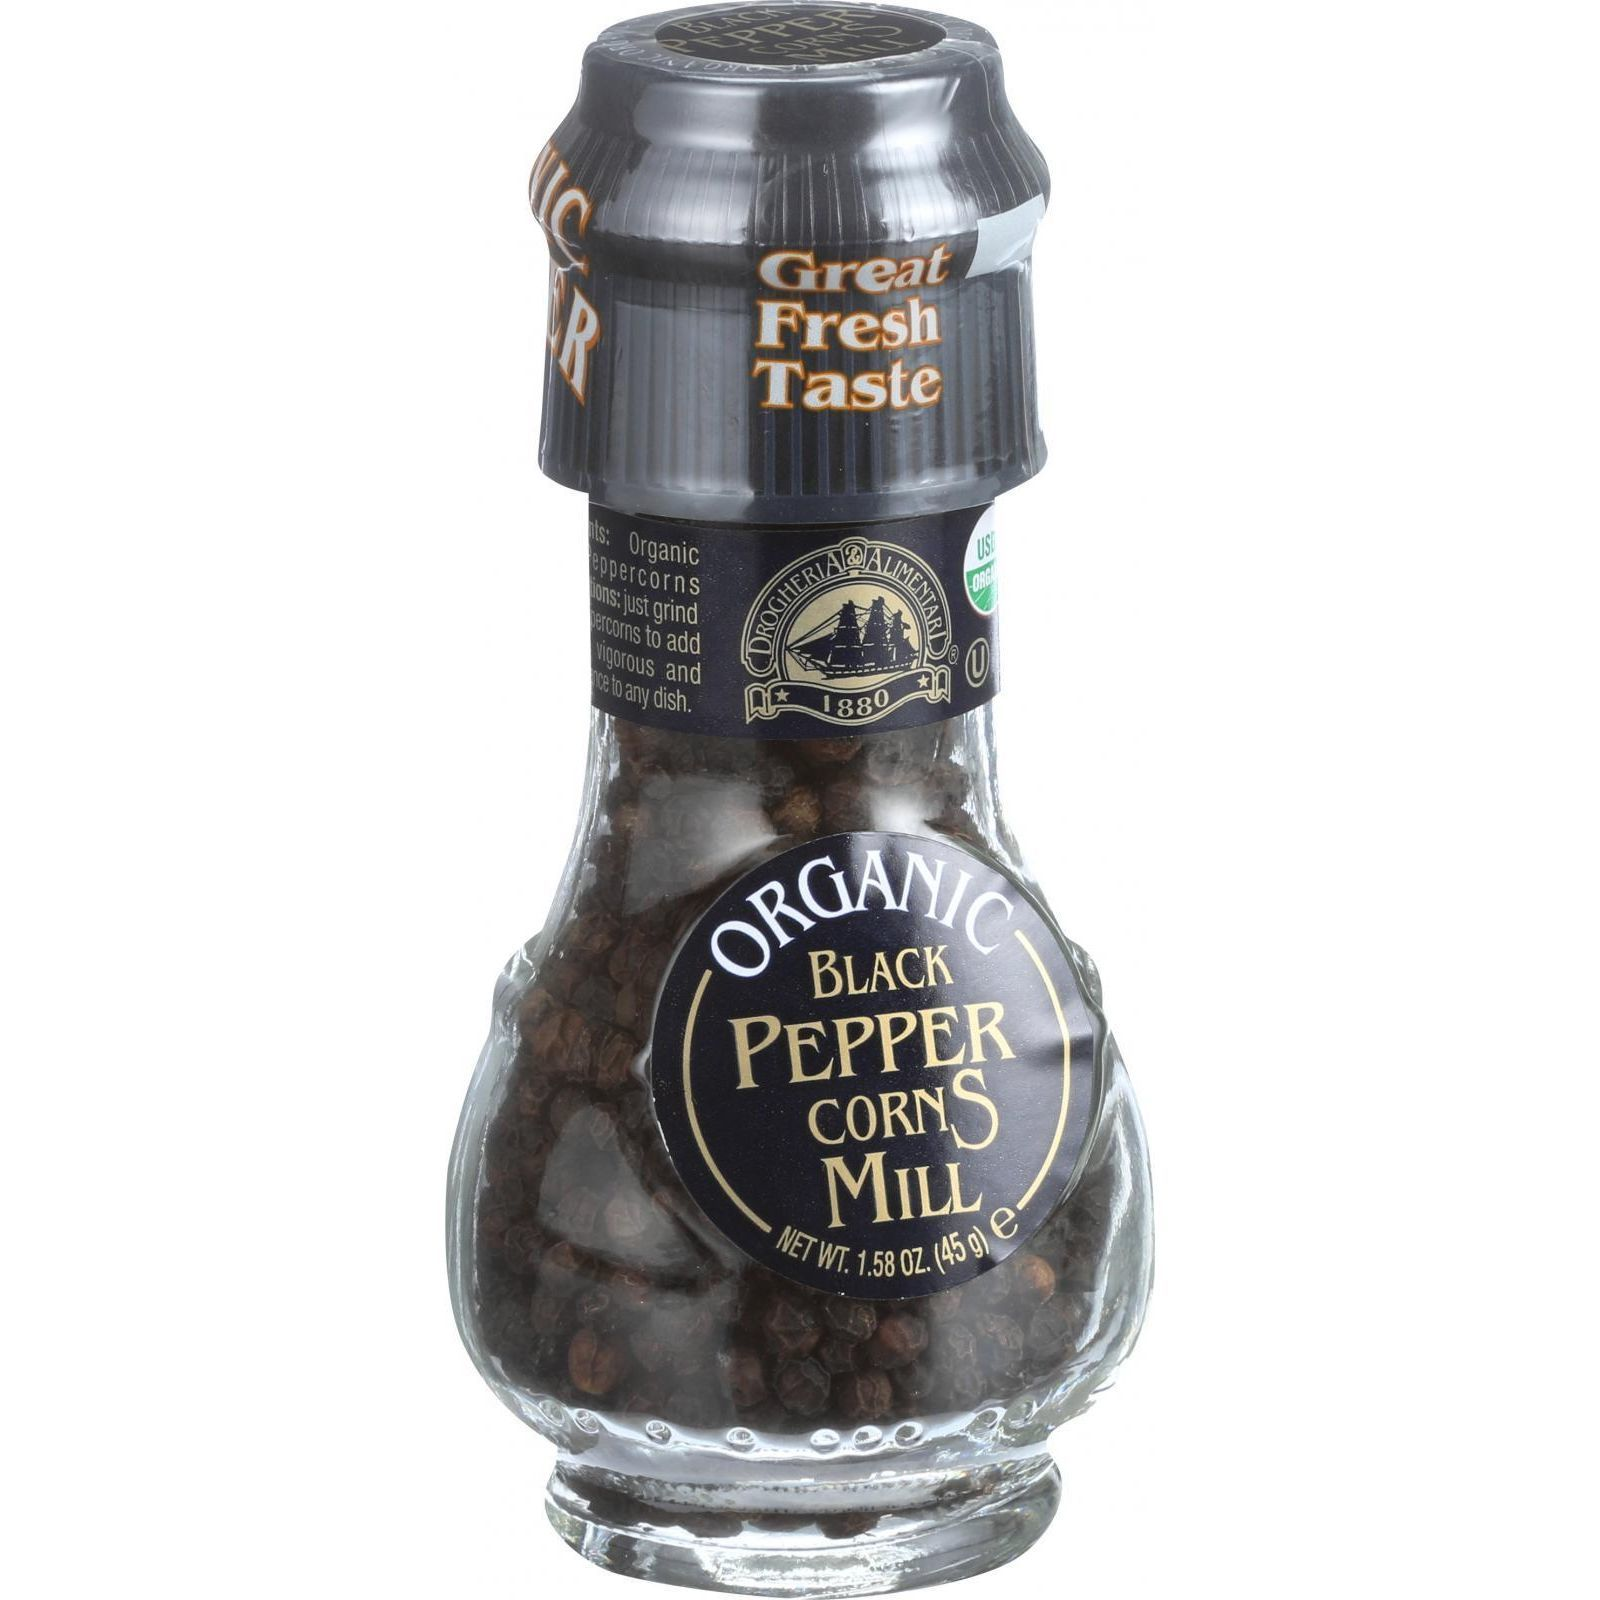 Drogheria and Alimentari Spice Mill - Organic Black Peppercorns - 1.6 oz - Case of 6